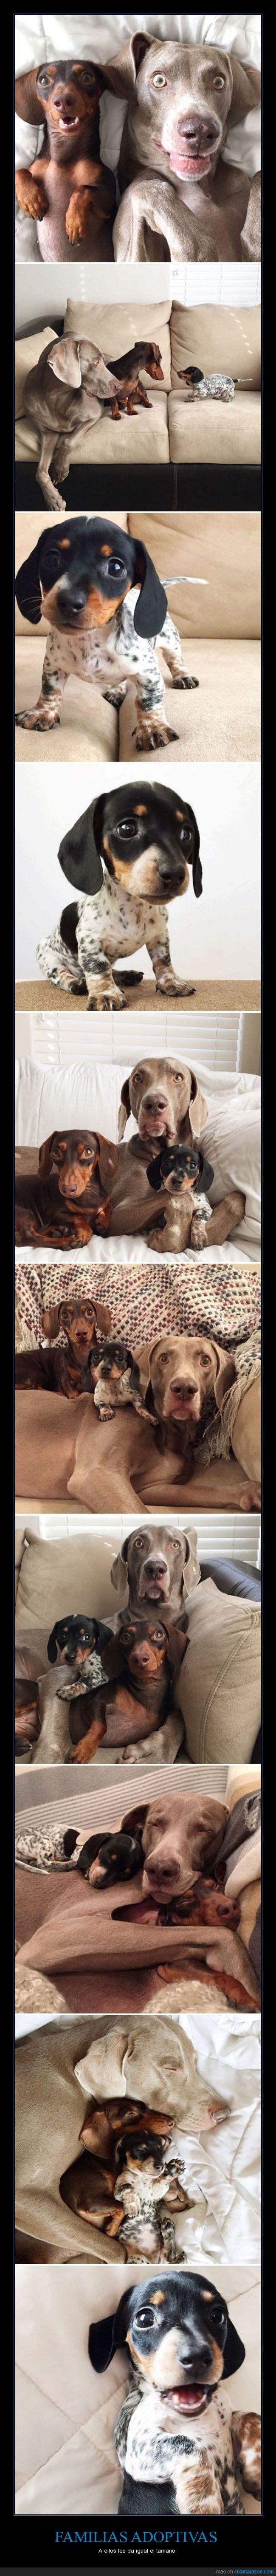 adoptar,amigo,cachorro,familia,grande,hermanito,hermano,pequeño,perro